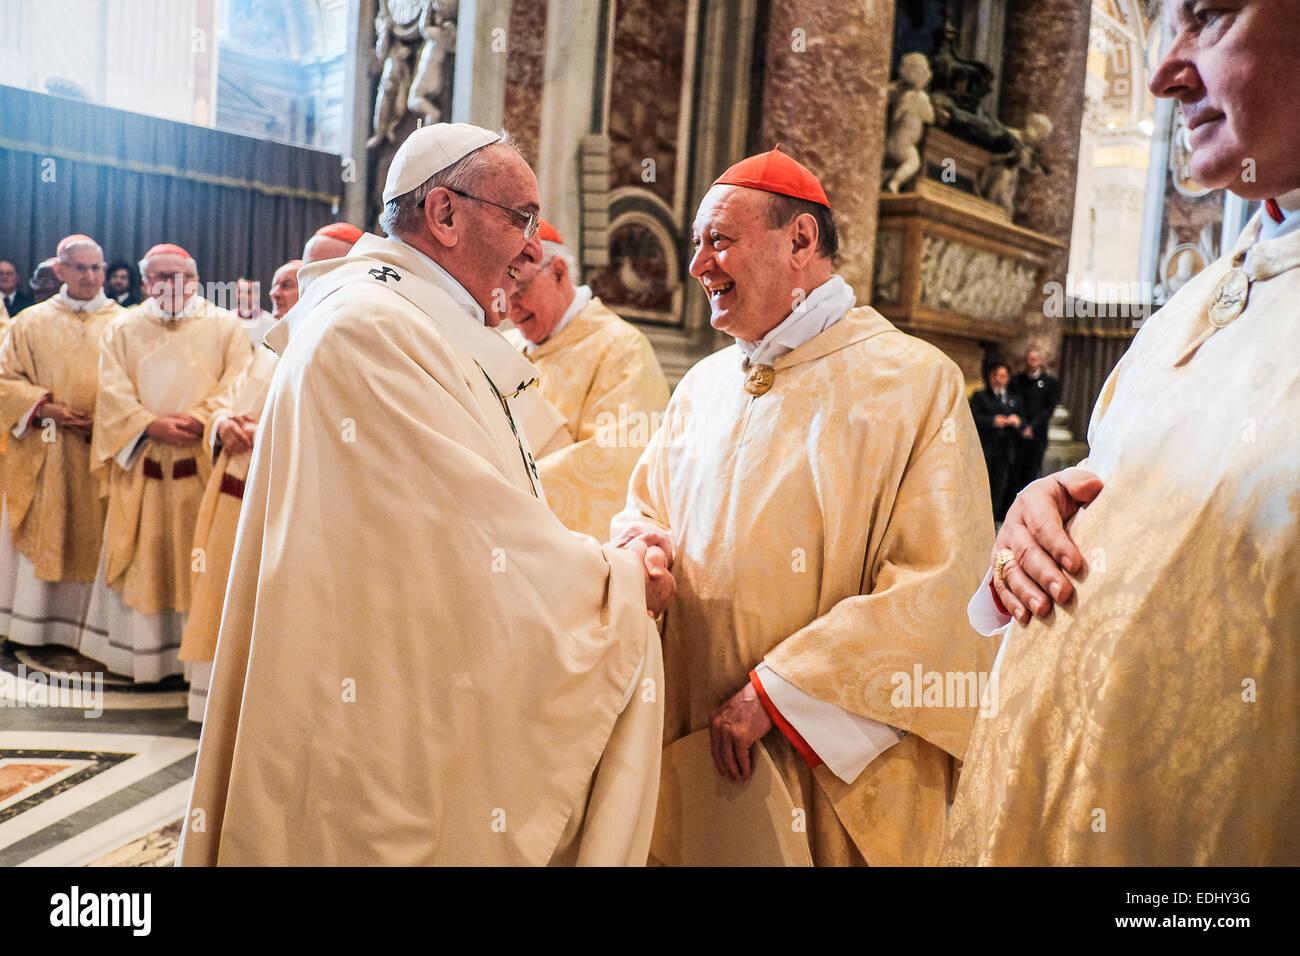 Holy Mass of the Epiphany - Pope Francis - Stock Image